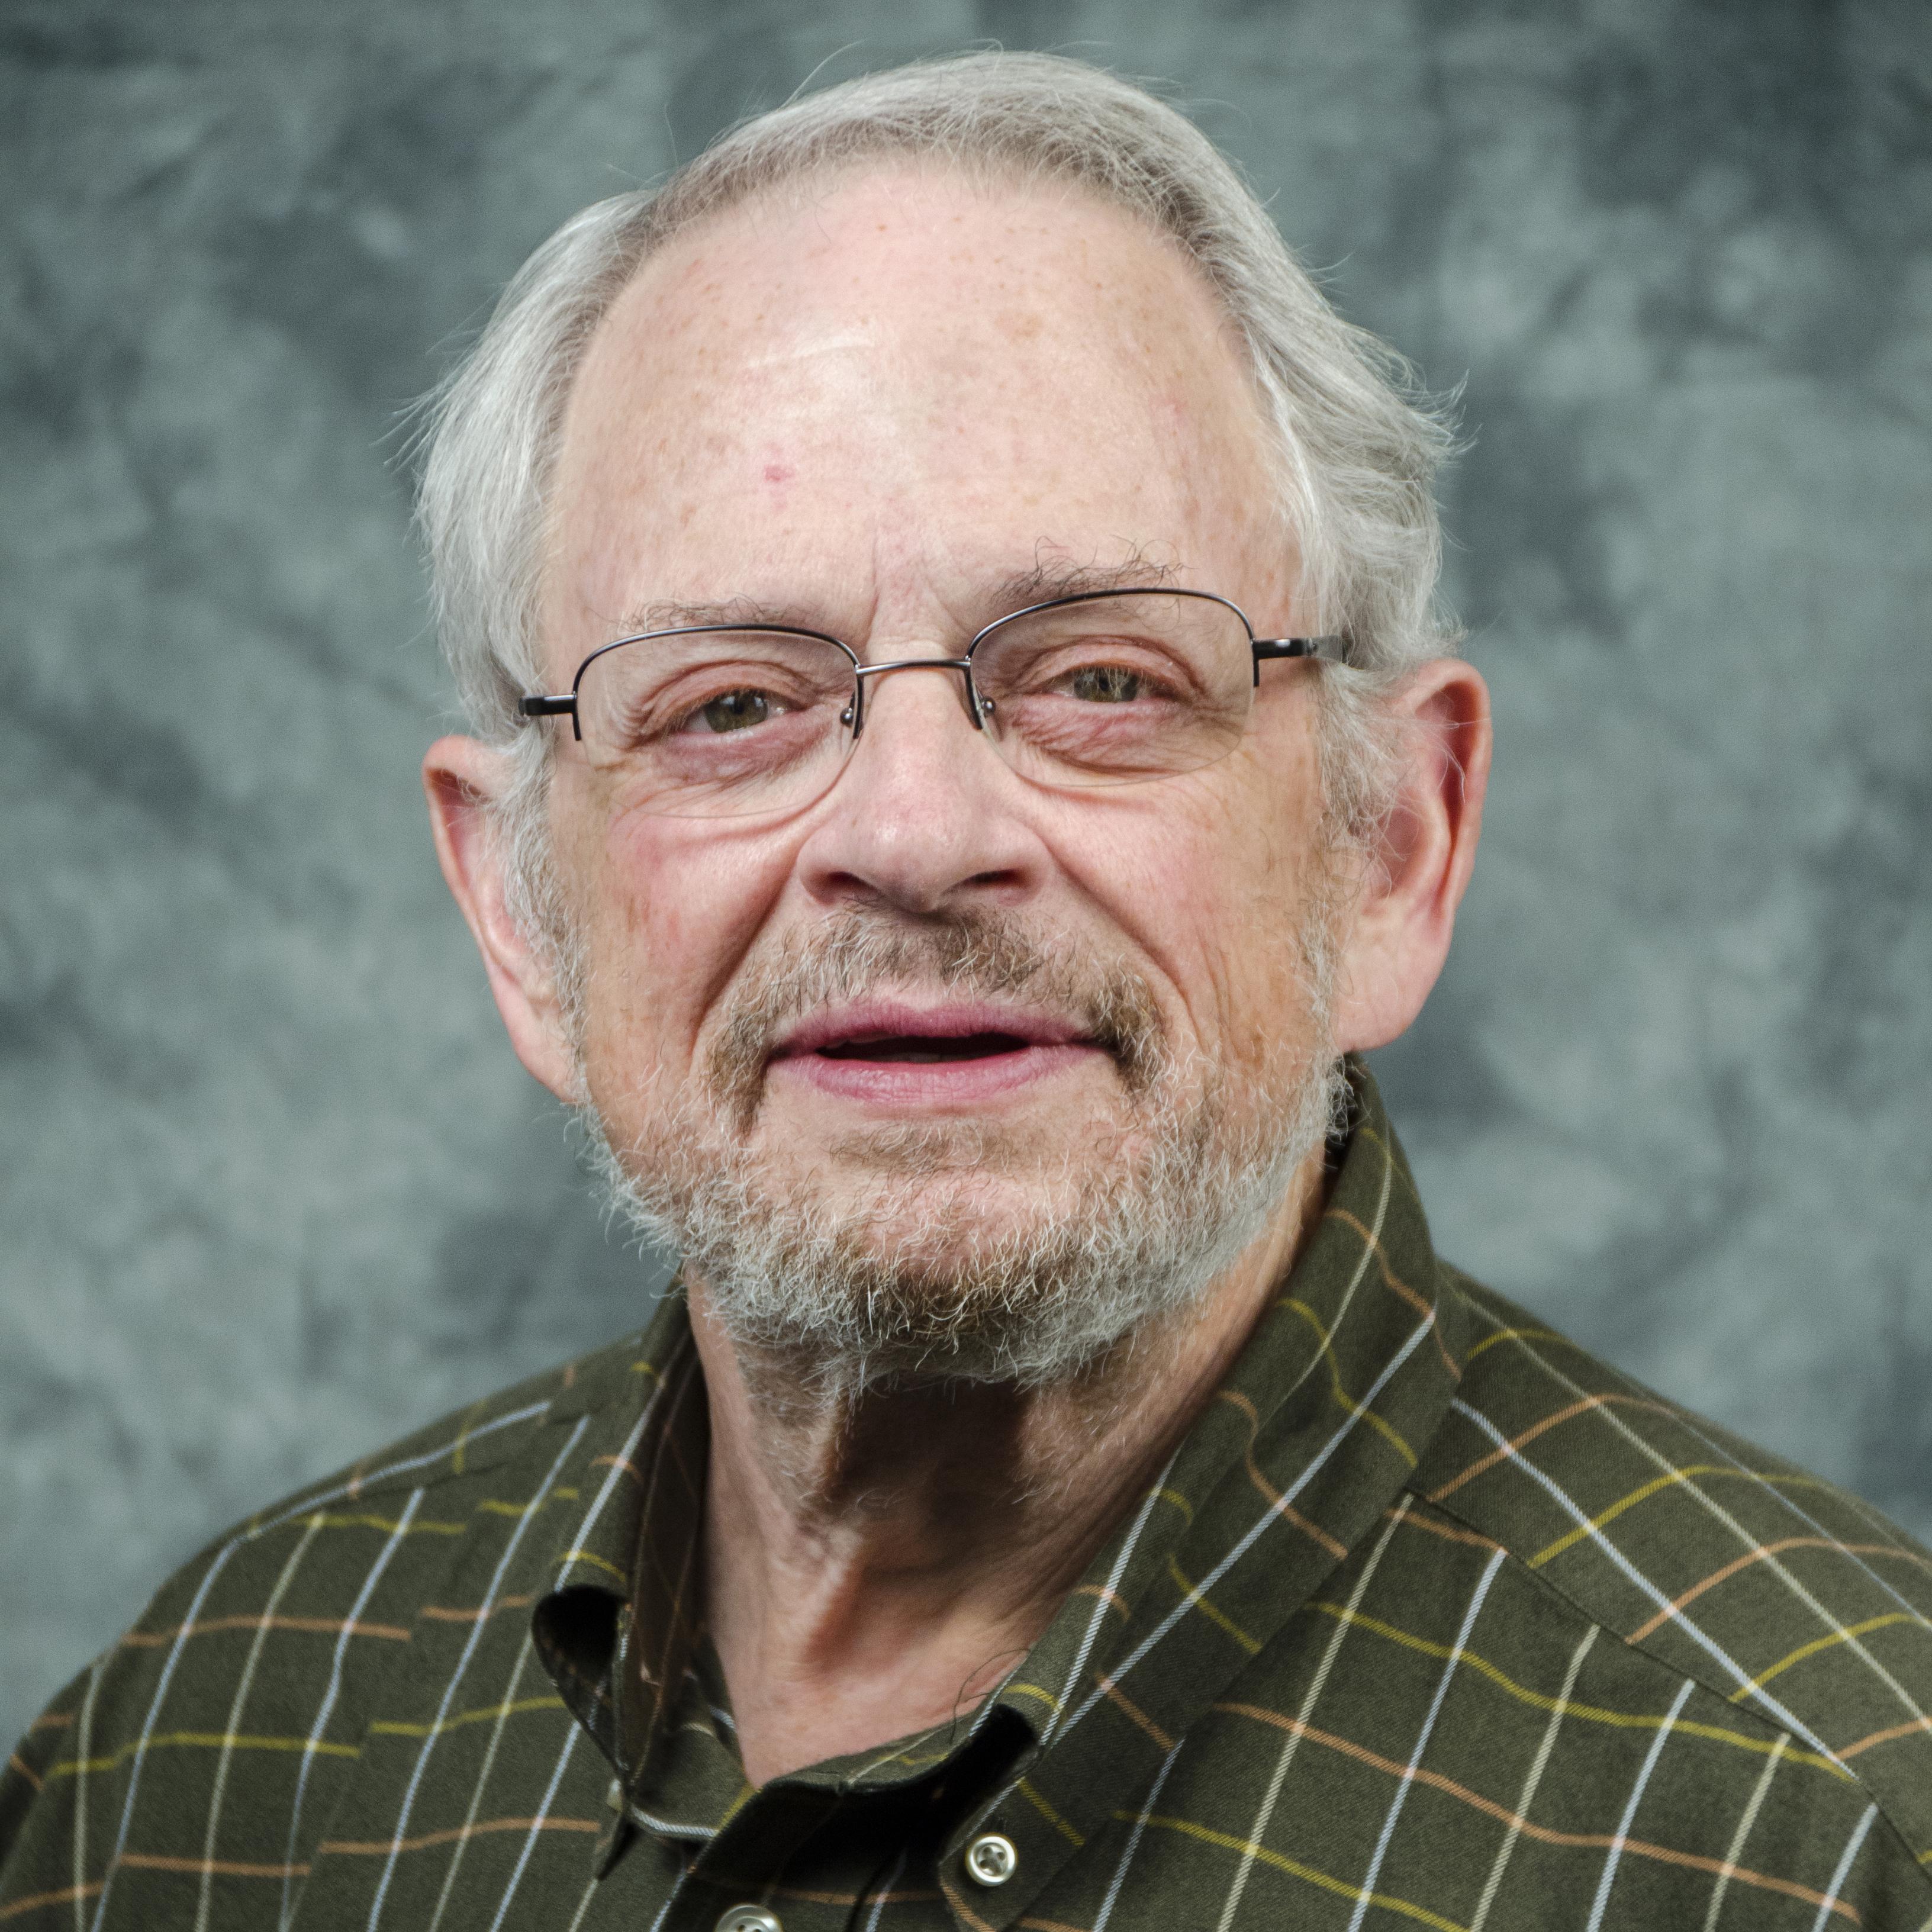 Joseph R. Sharkey